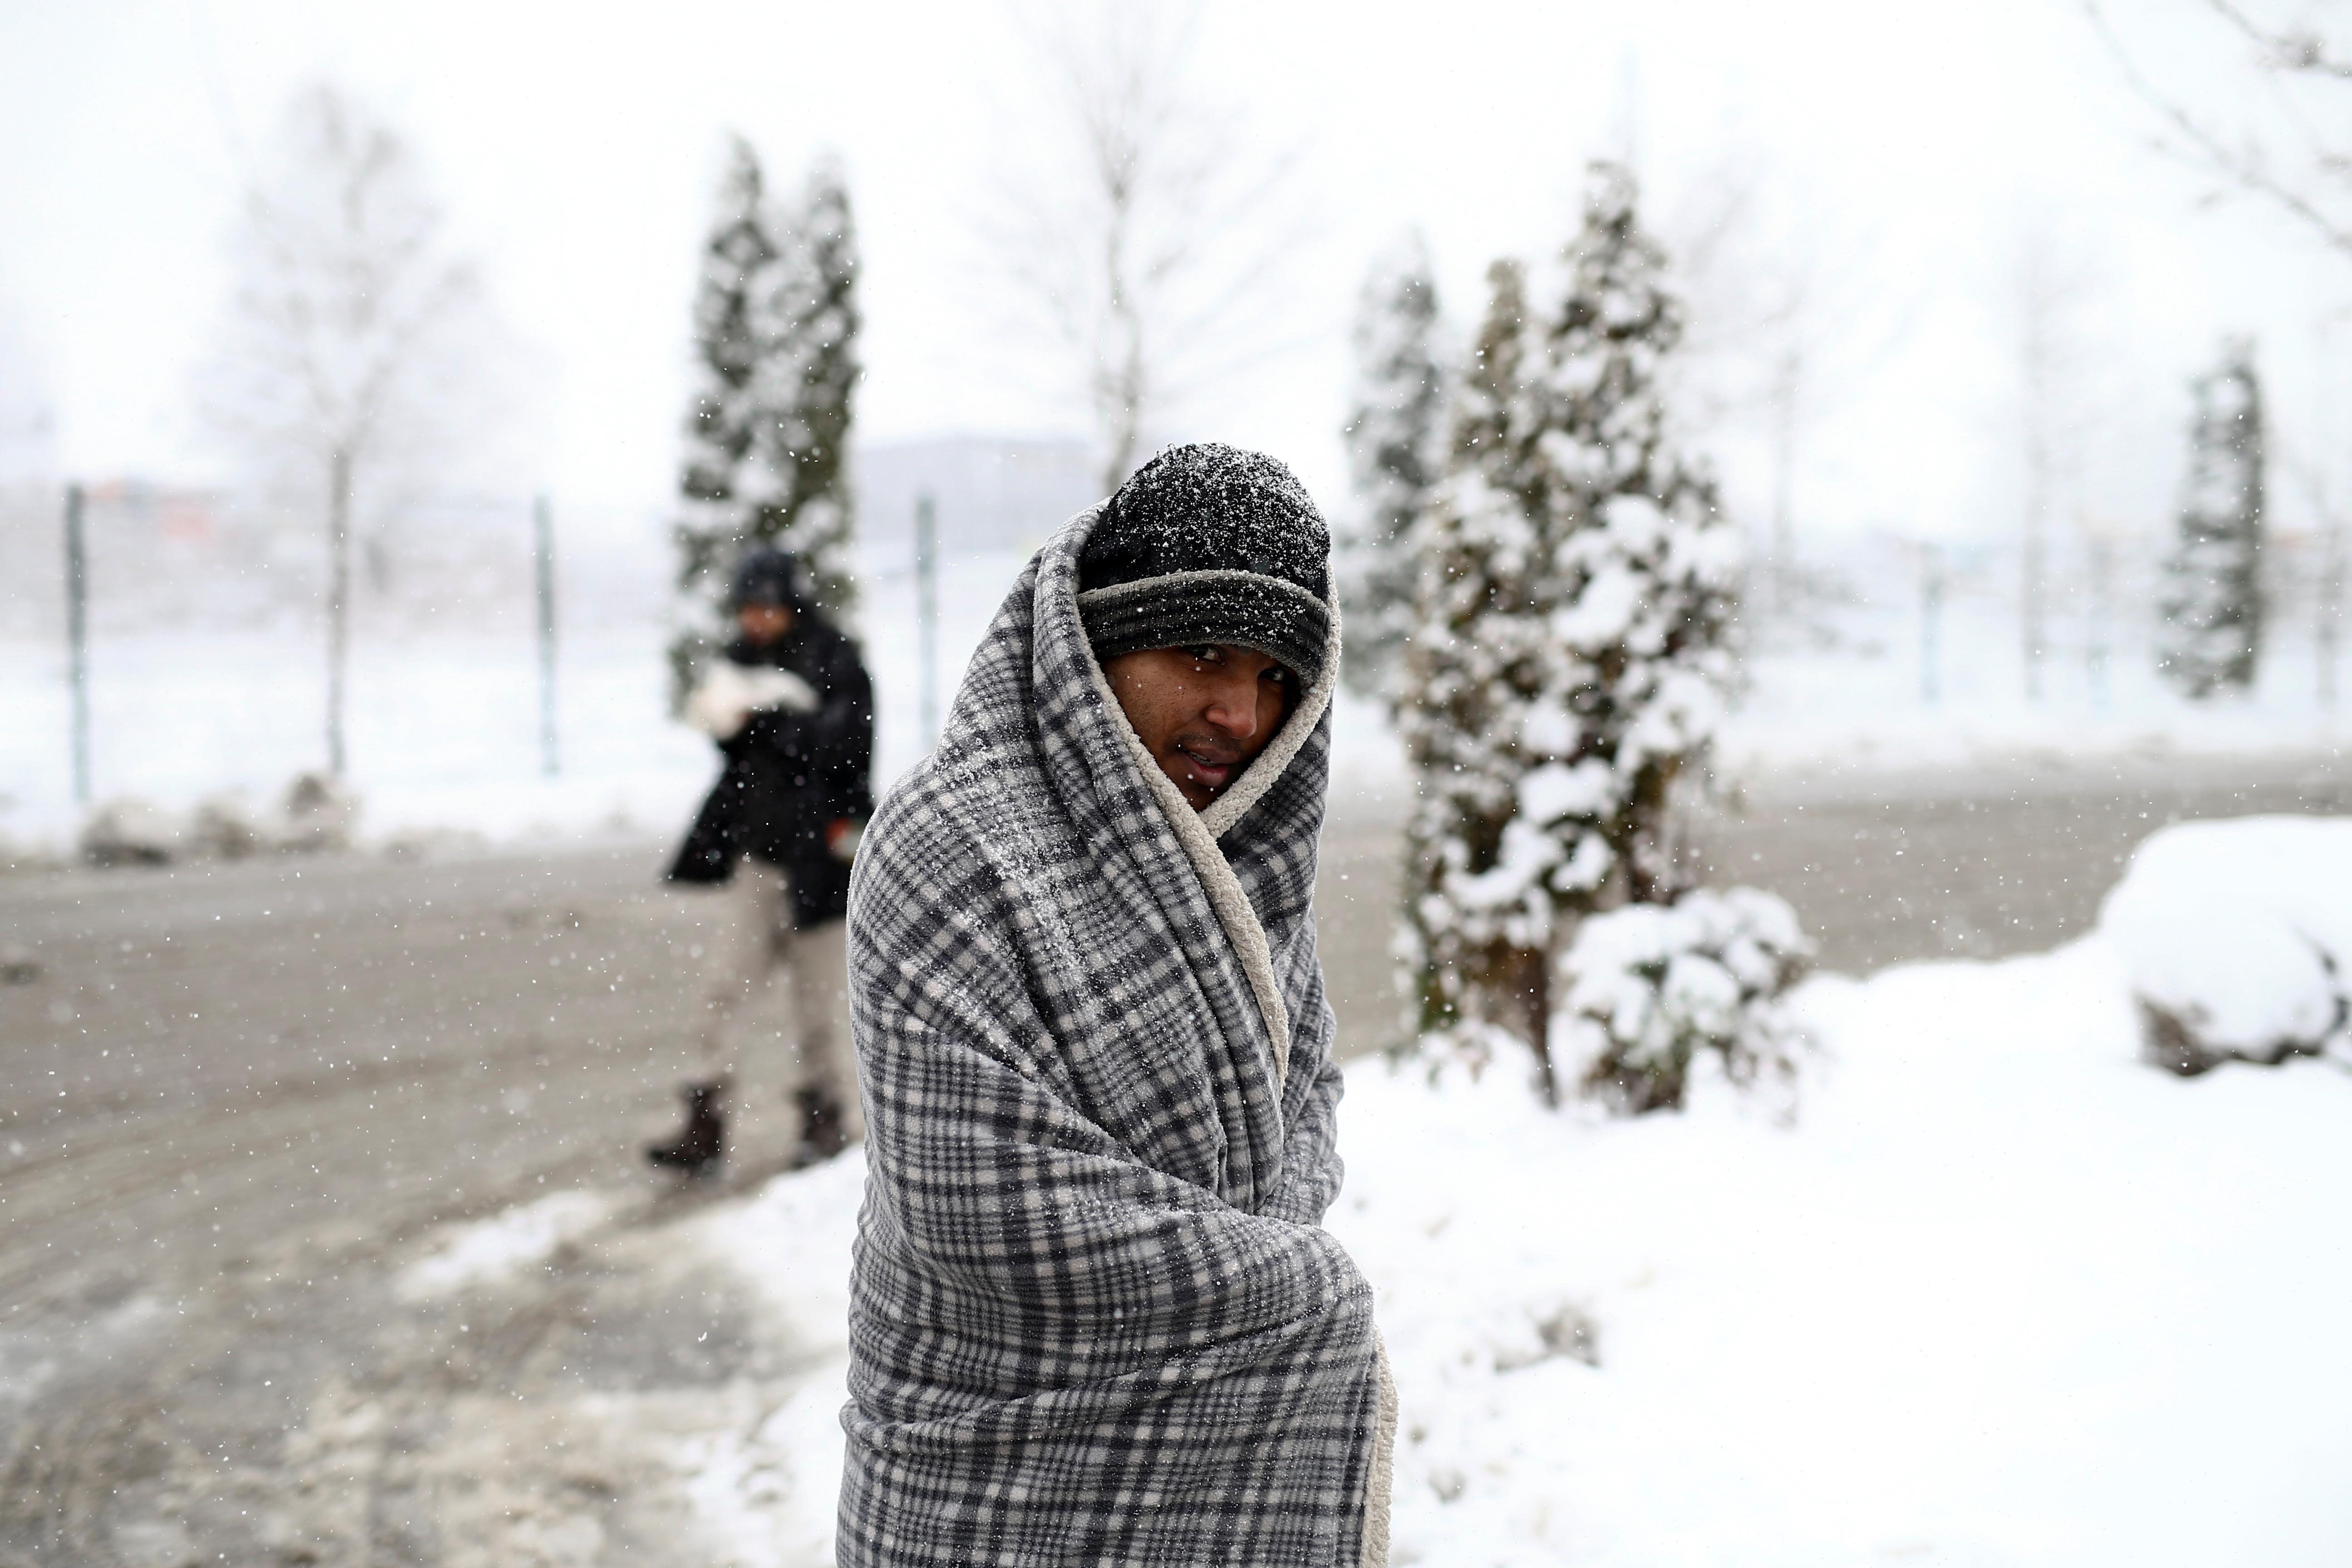 Weather, police stop migrants at EU frontier